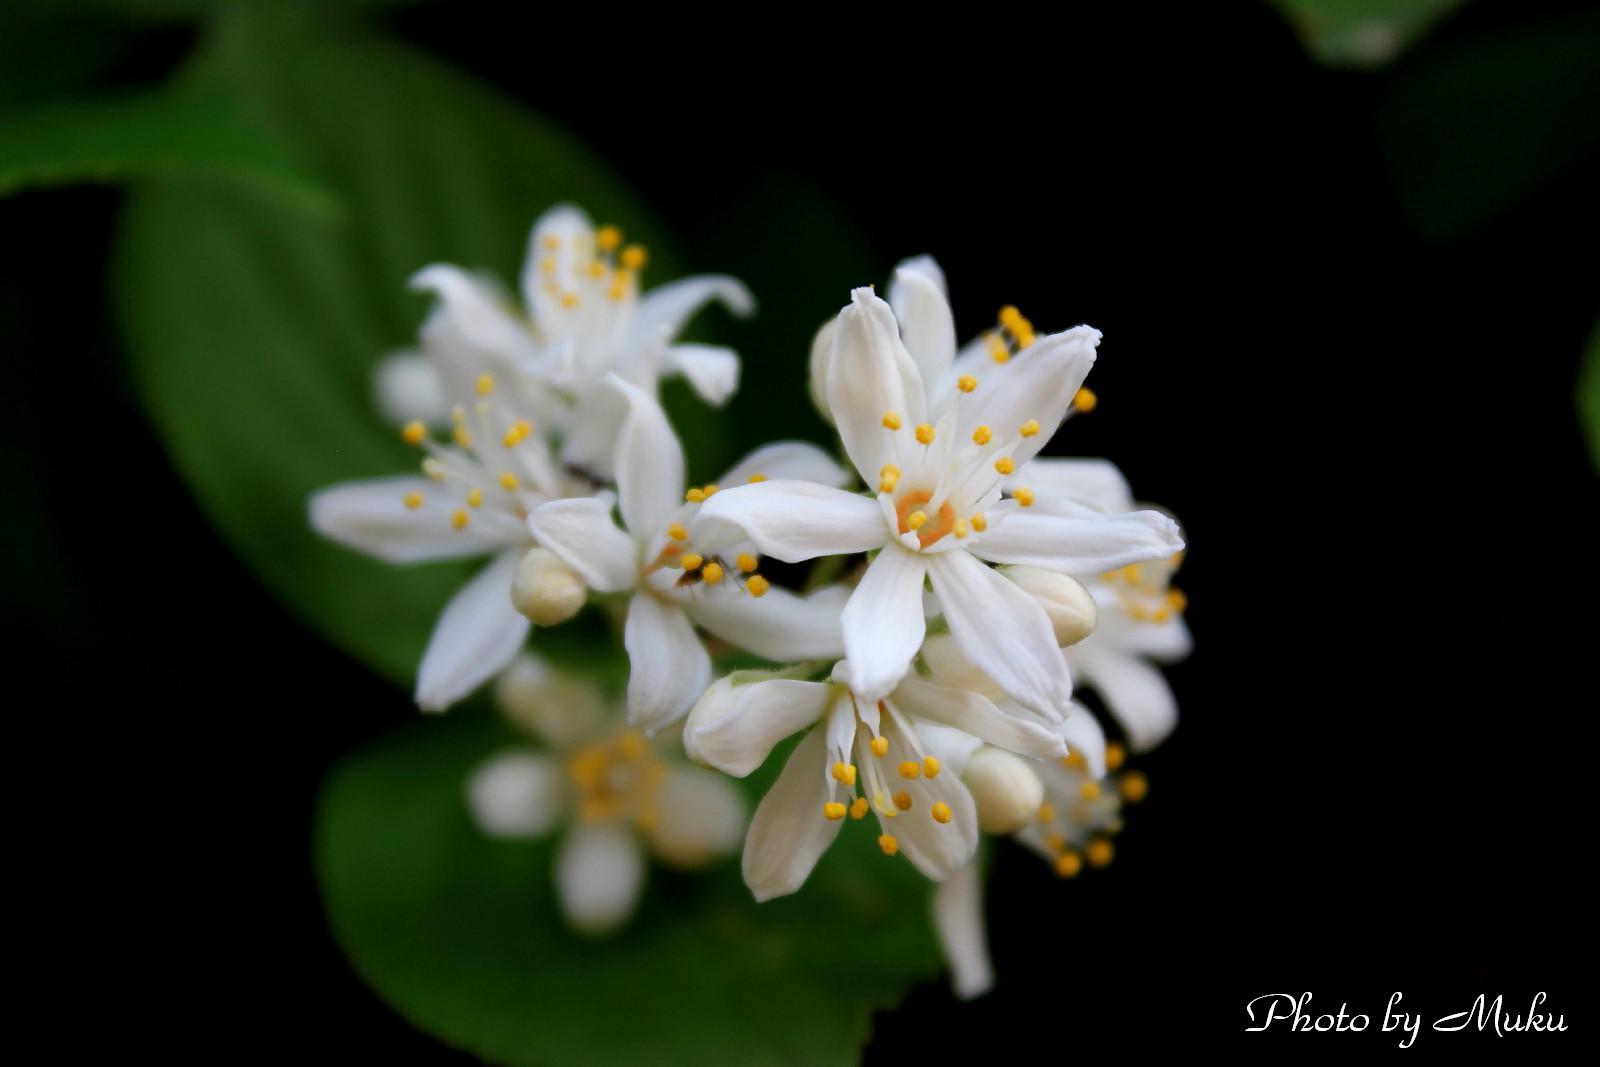 2014/05/02 六弁の卯の花(散歩道:神奈川県横須賀市)